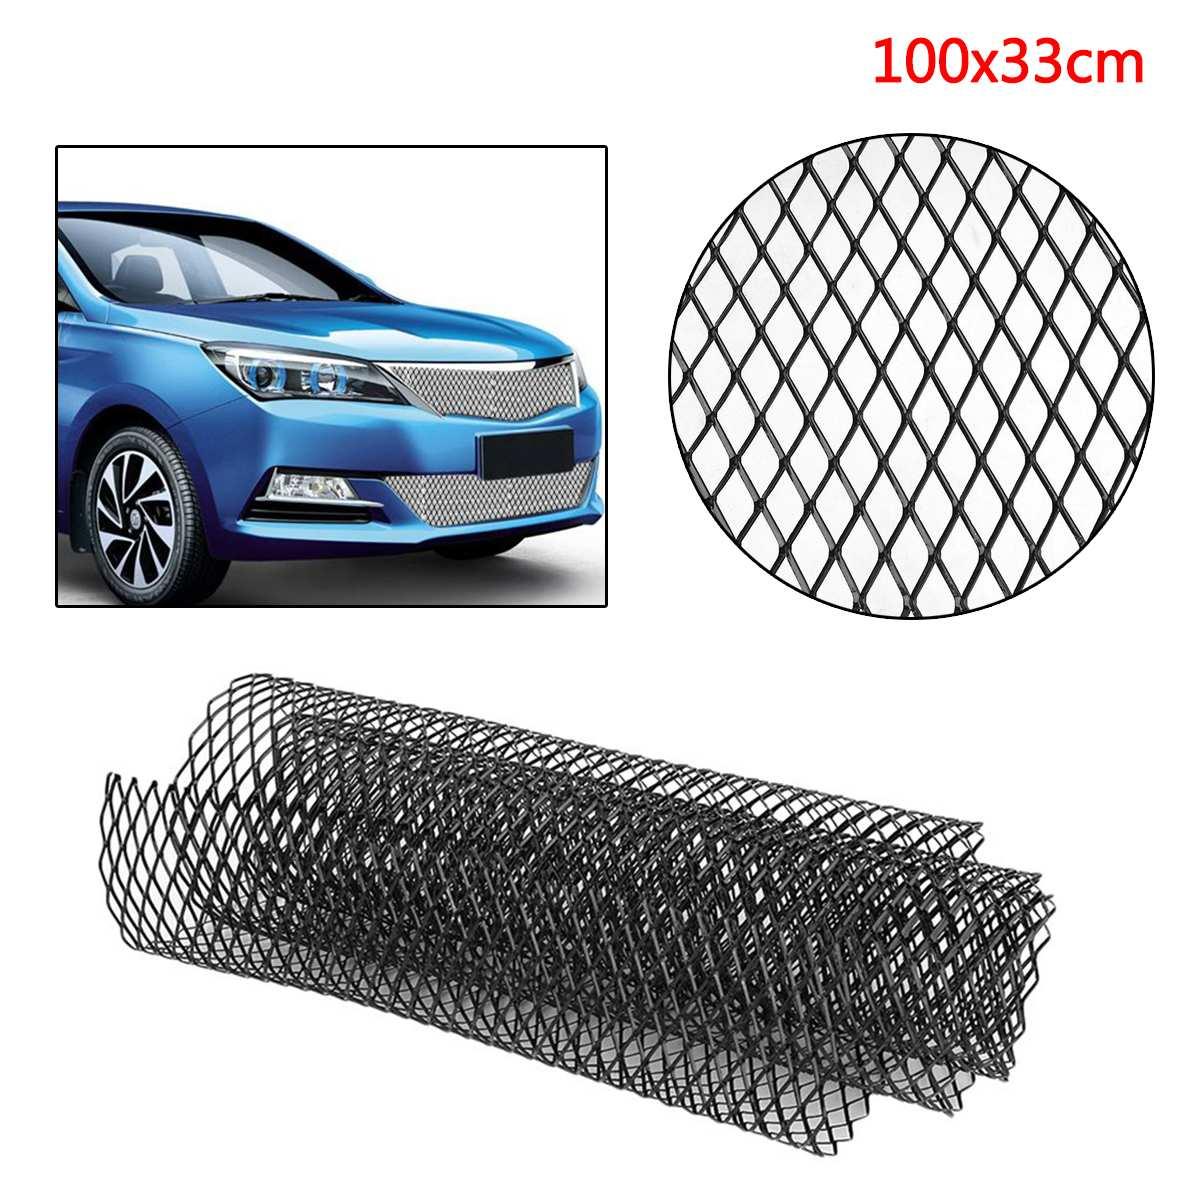 100x30cm Auto Car Universal Aluminum Alloy Car Front Bumper Mesh Grill Grille Cover Car Vehicle Black Body Grille Net Protector